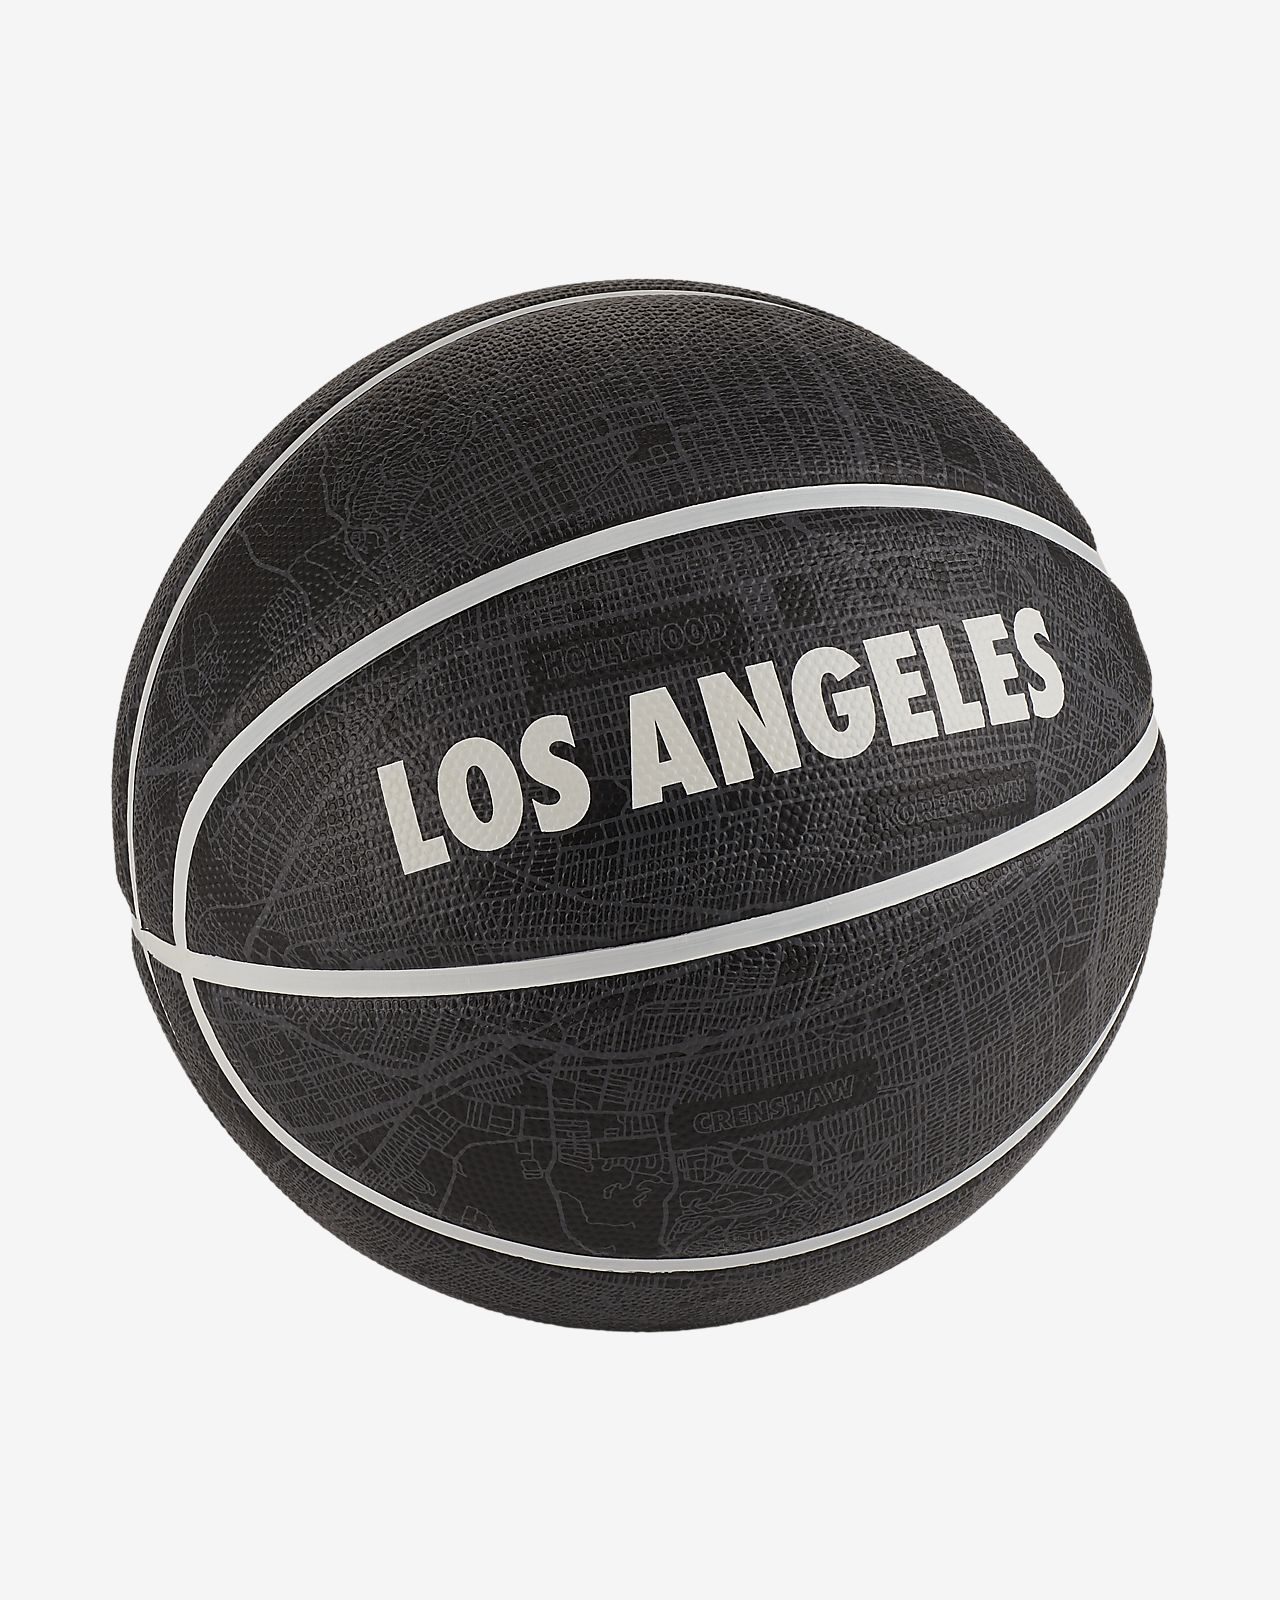 Nike Dominate 8P (Los Angeles) Basketball